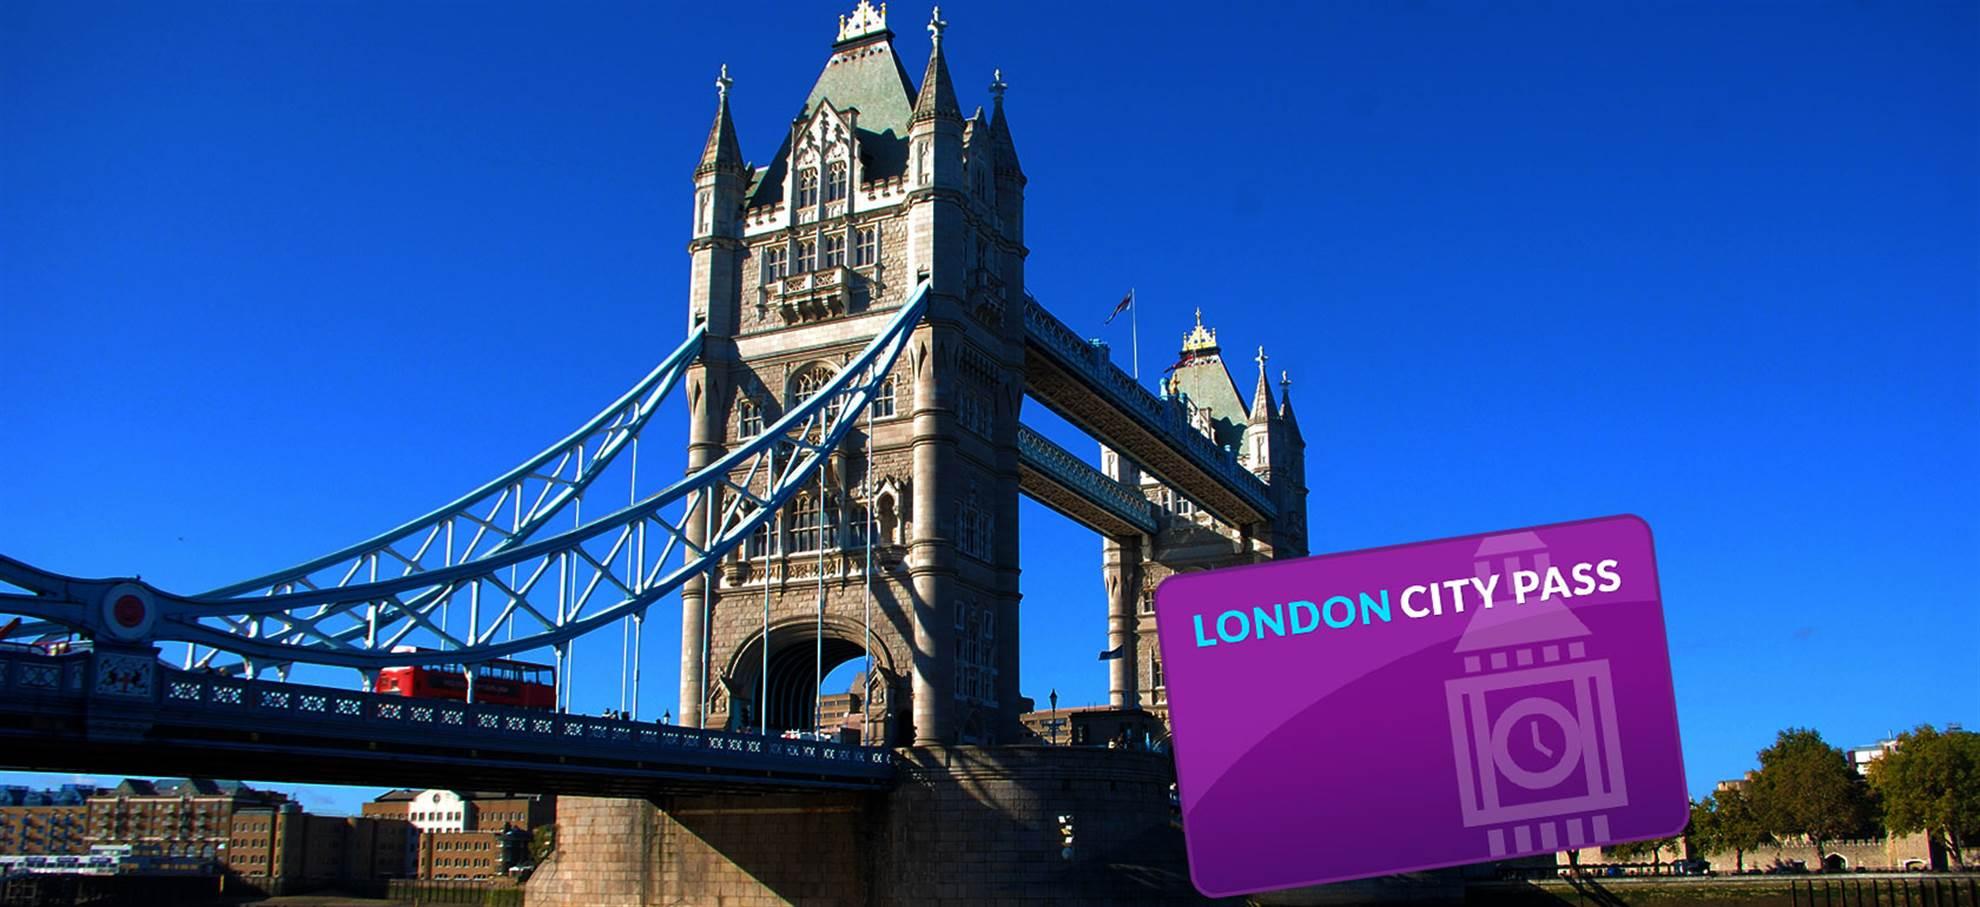 Лондон City Pass (+ колесо обозрения London Eye)